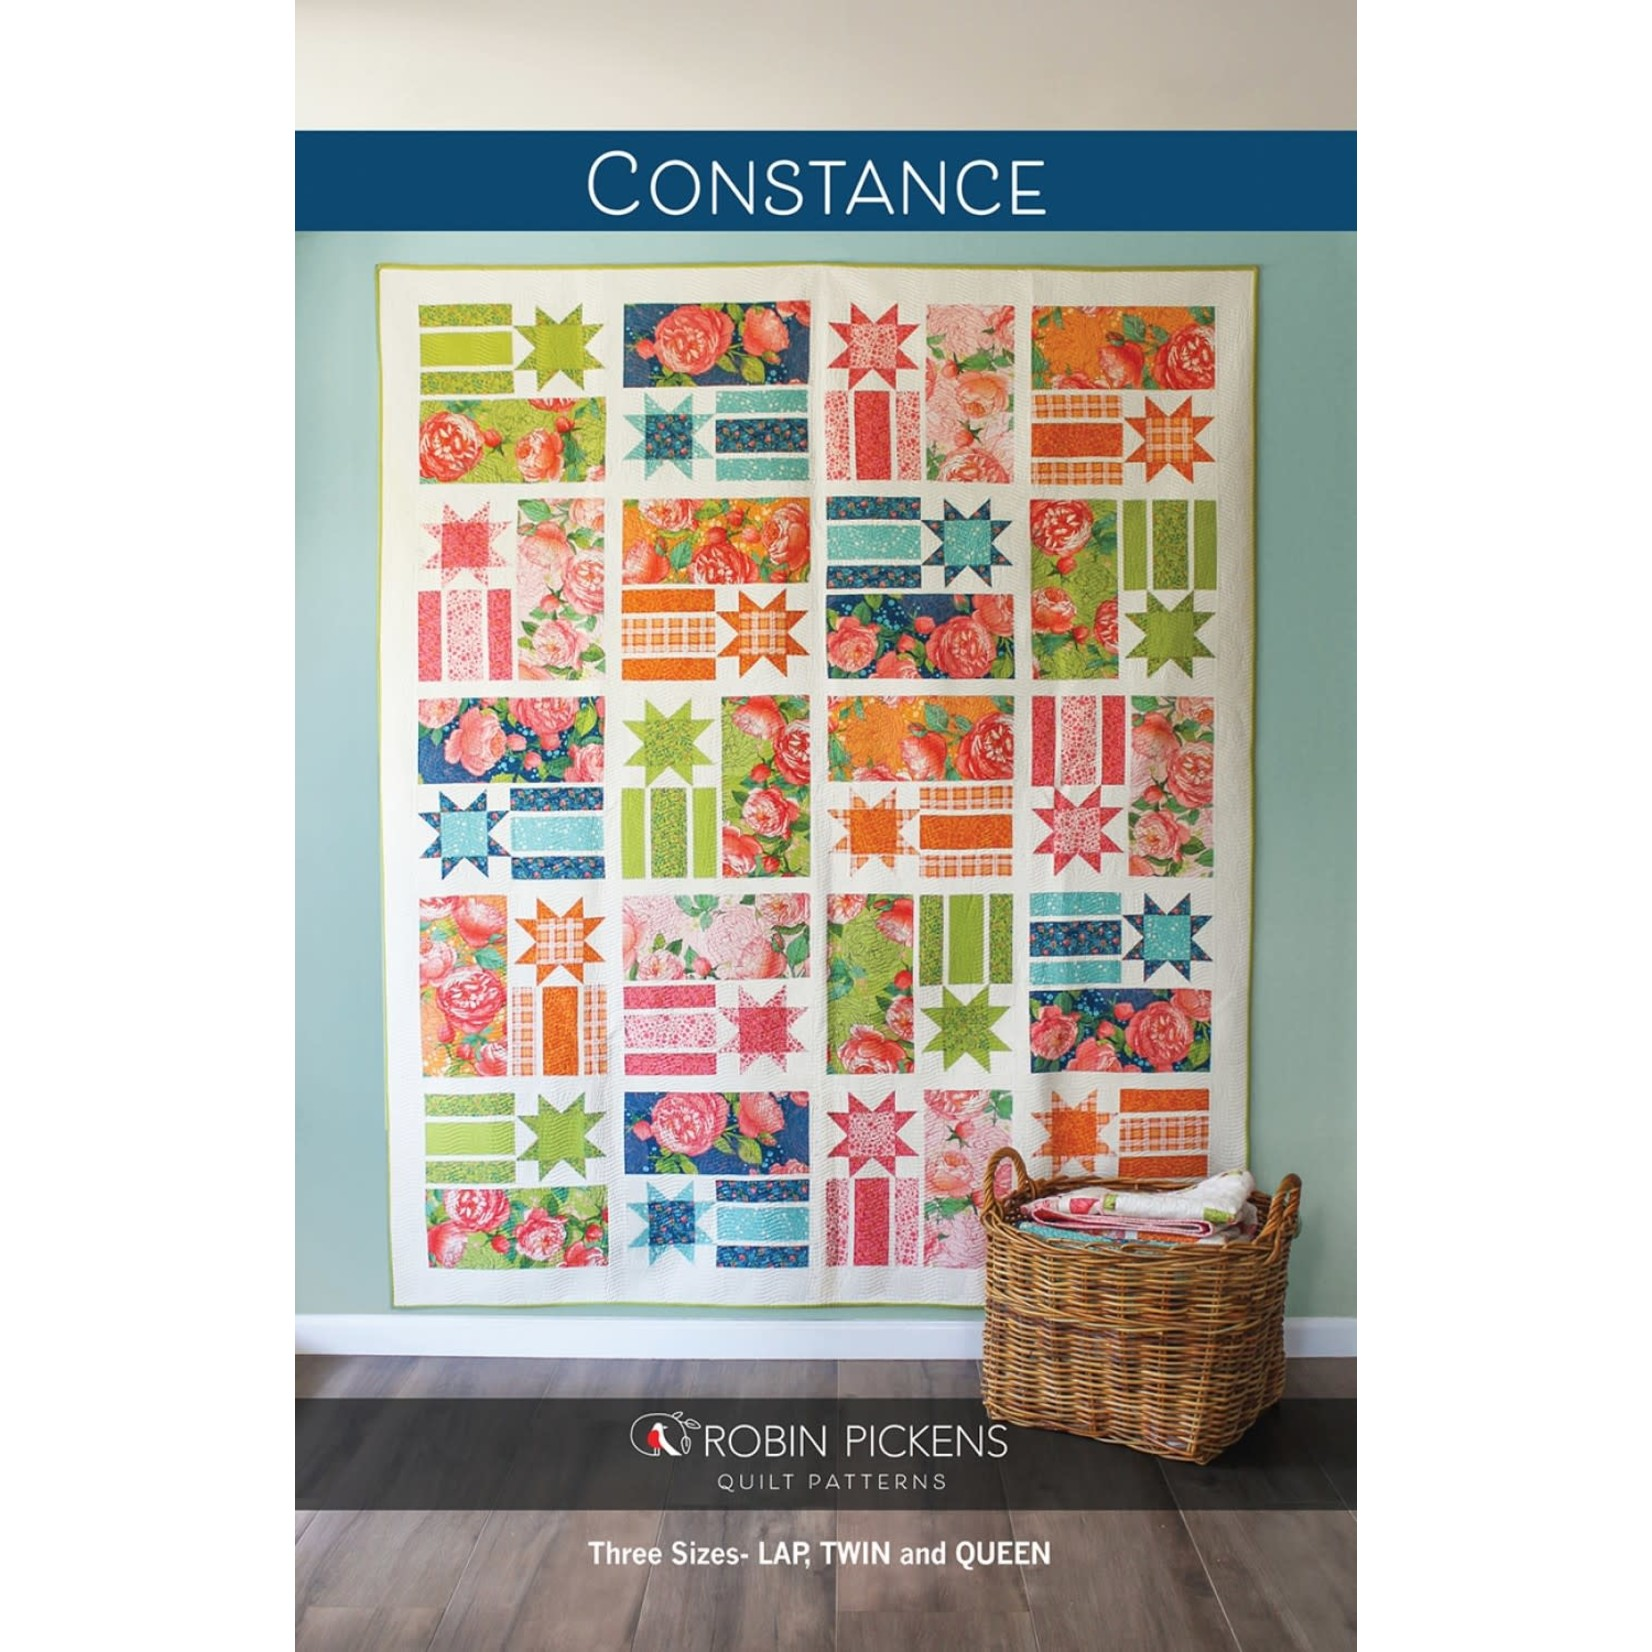 Robin Pickens Quilt Patterns Constance Quilt Pattern